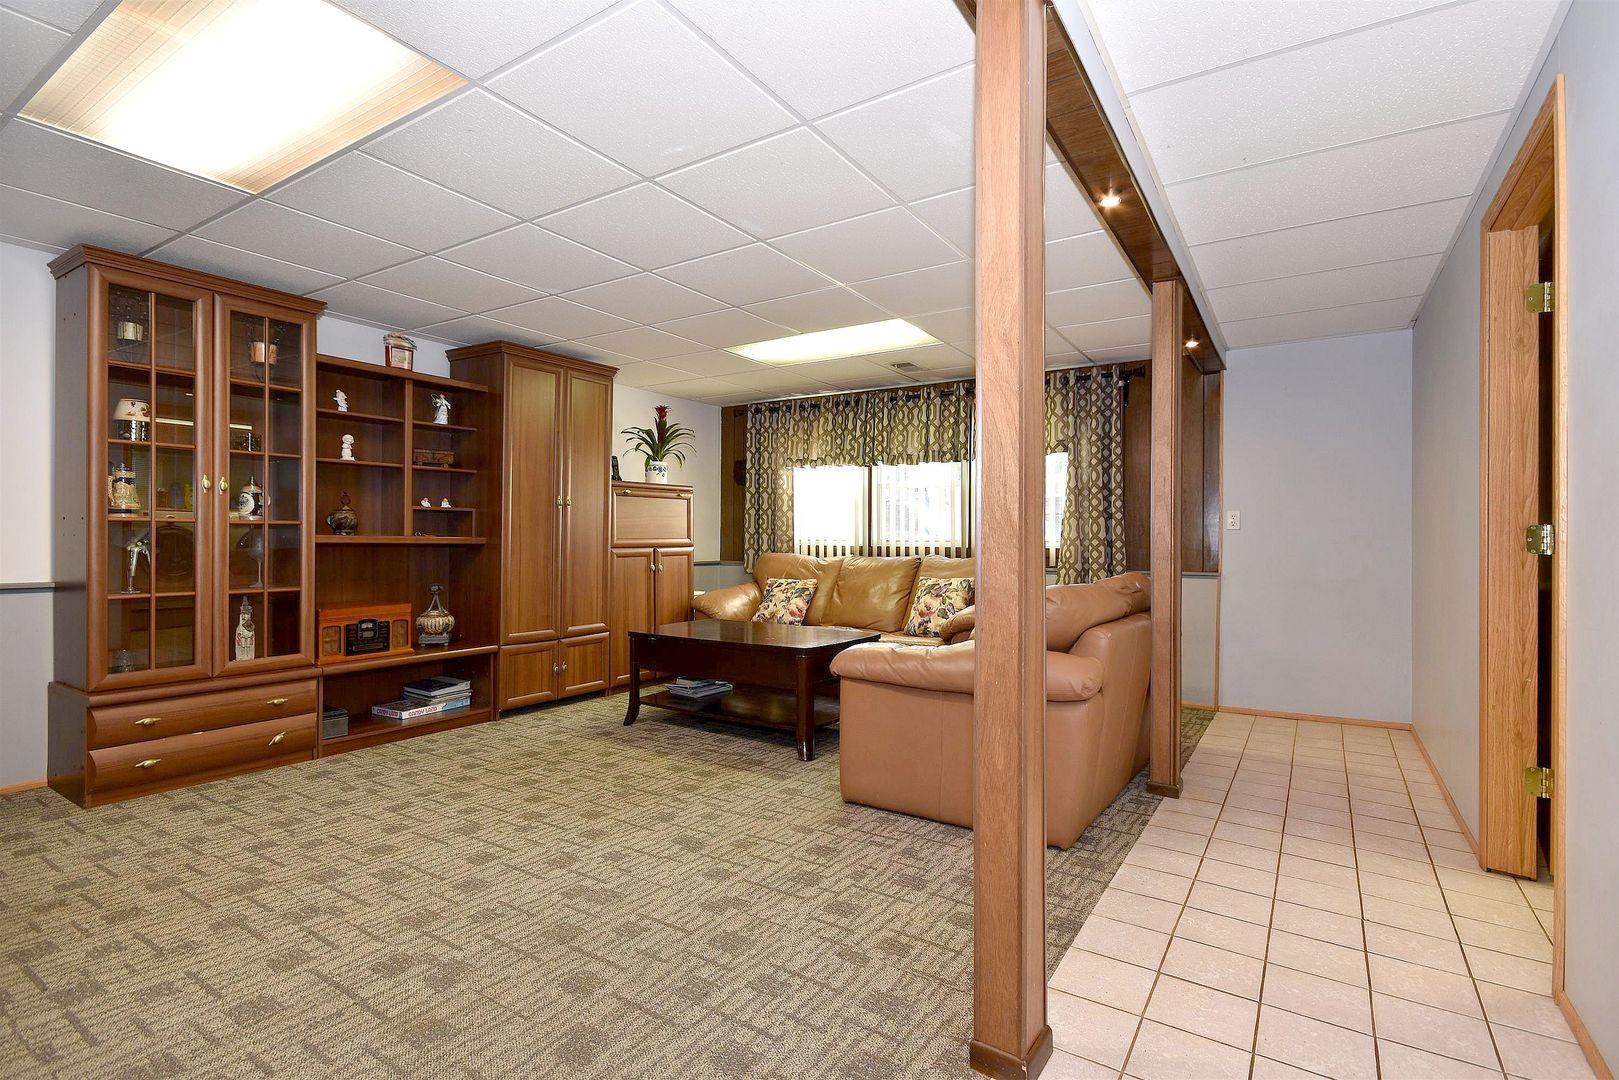 10864 Liberty Grove, Willow Springs, Illinois, 60480